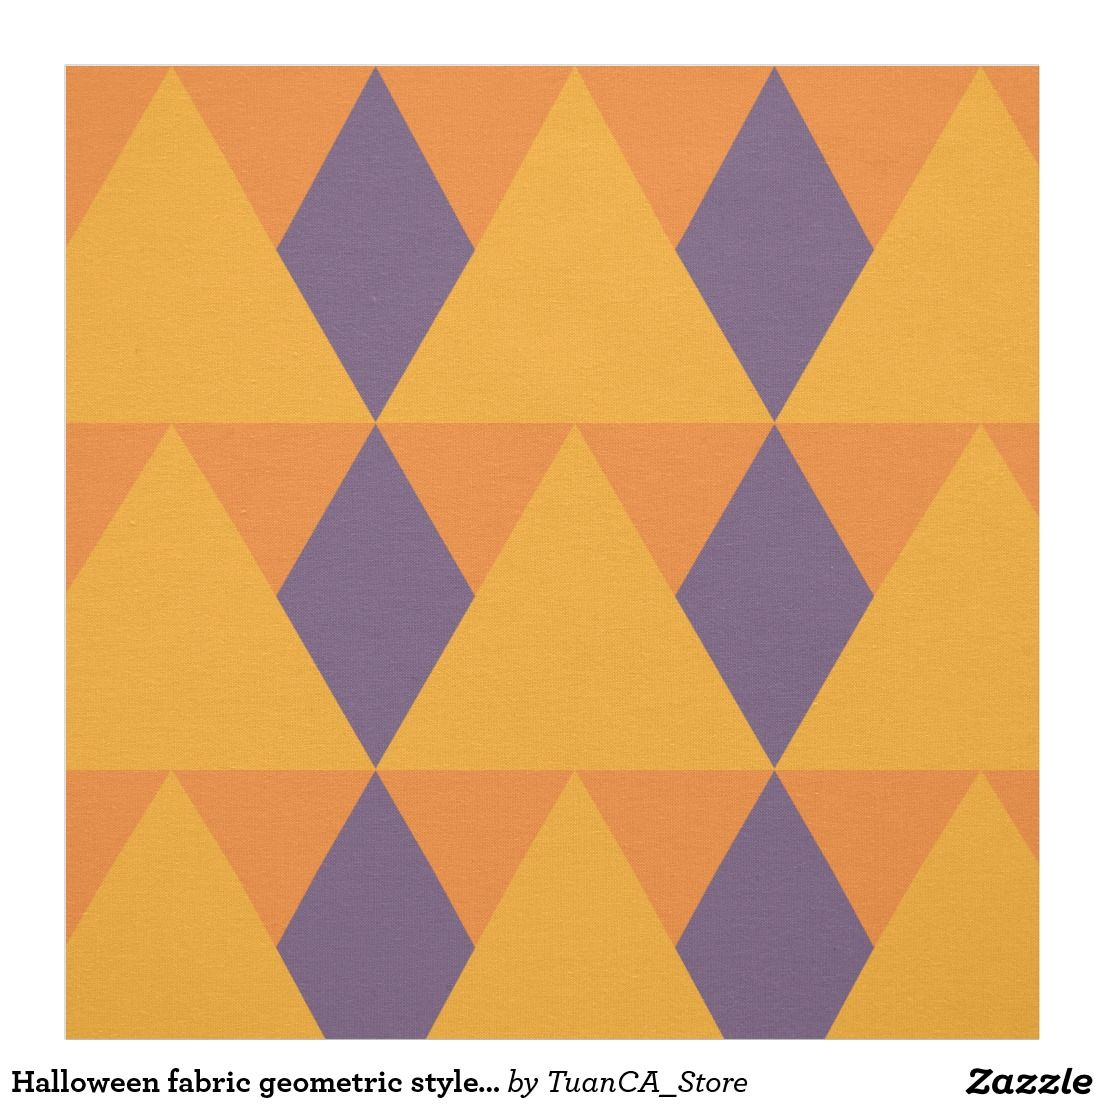 Halloween fabric geometric style 2